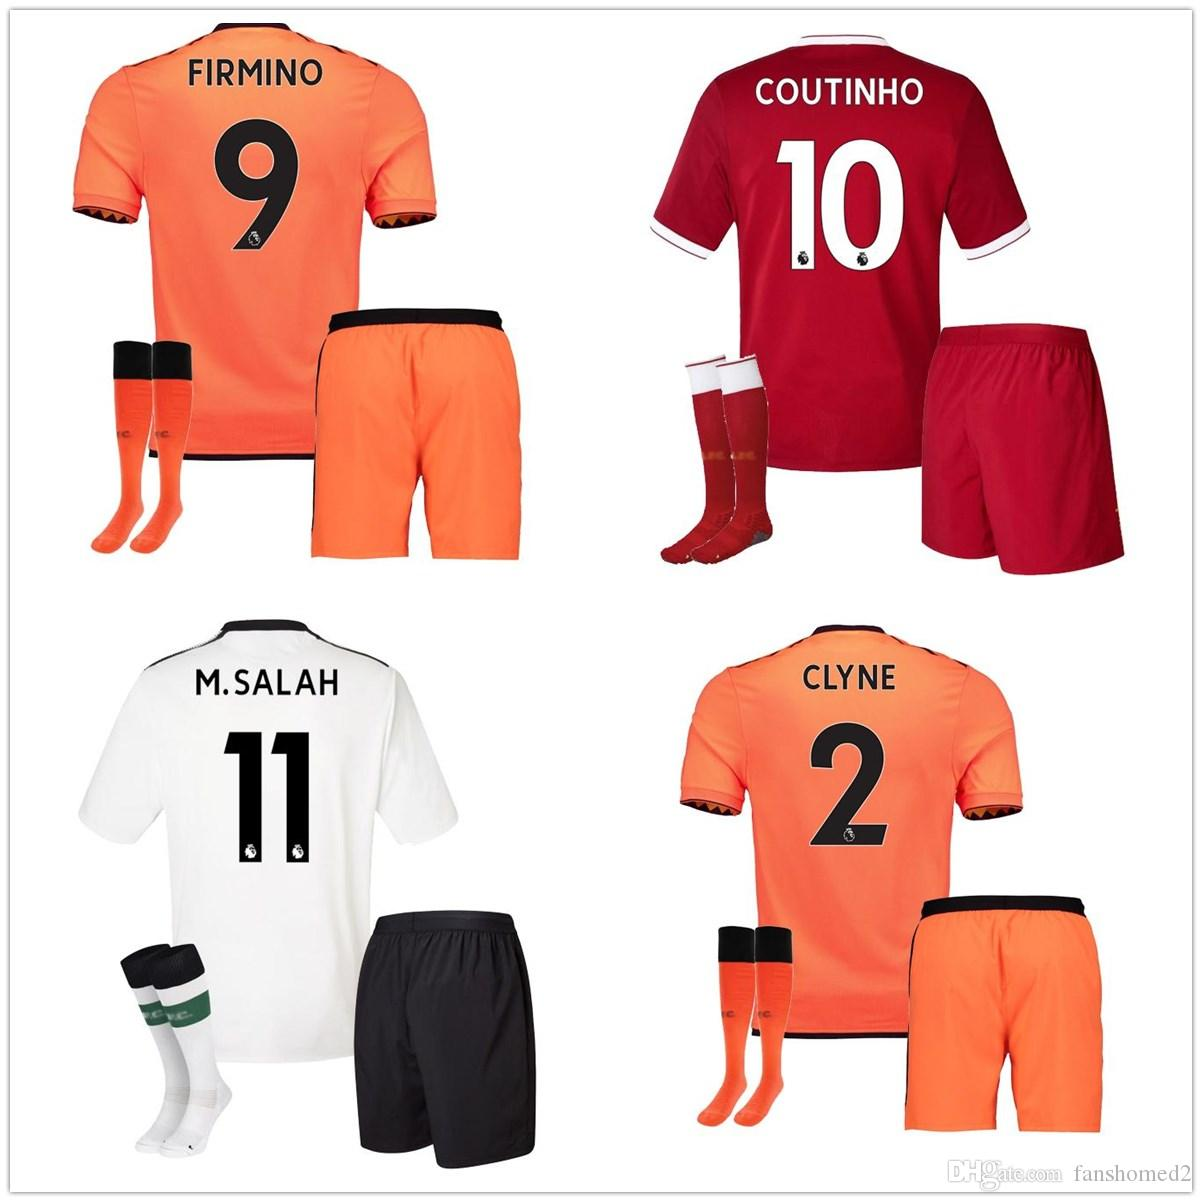 df3cc94c64 Compre 2017 2018 Third Lvp Full Sets Visitante Home Salah Soccer Sets  Hombre Firmino Milner Chamberlain Mane Lallana Virgil Sturridge Uniforme De  Fútbol Set ...